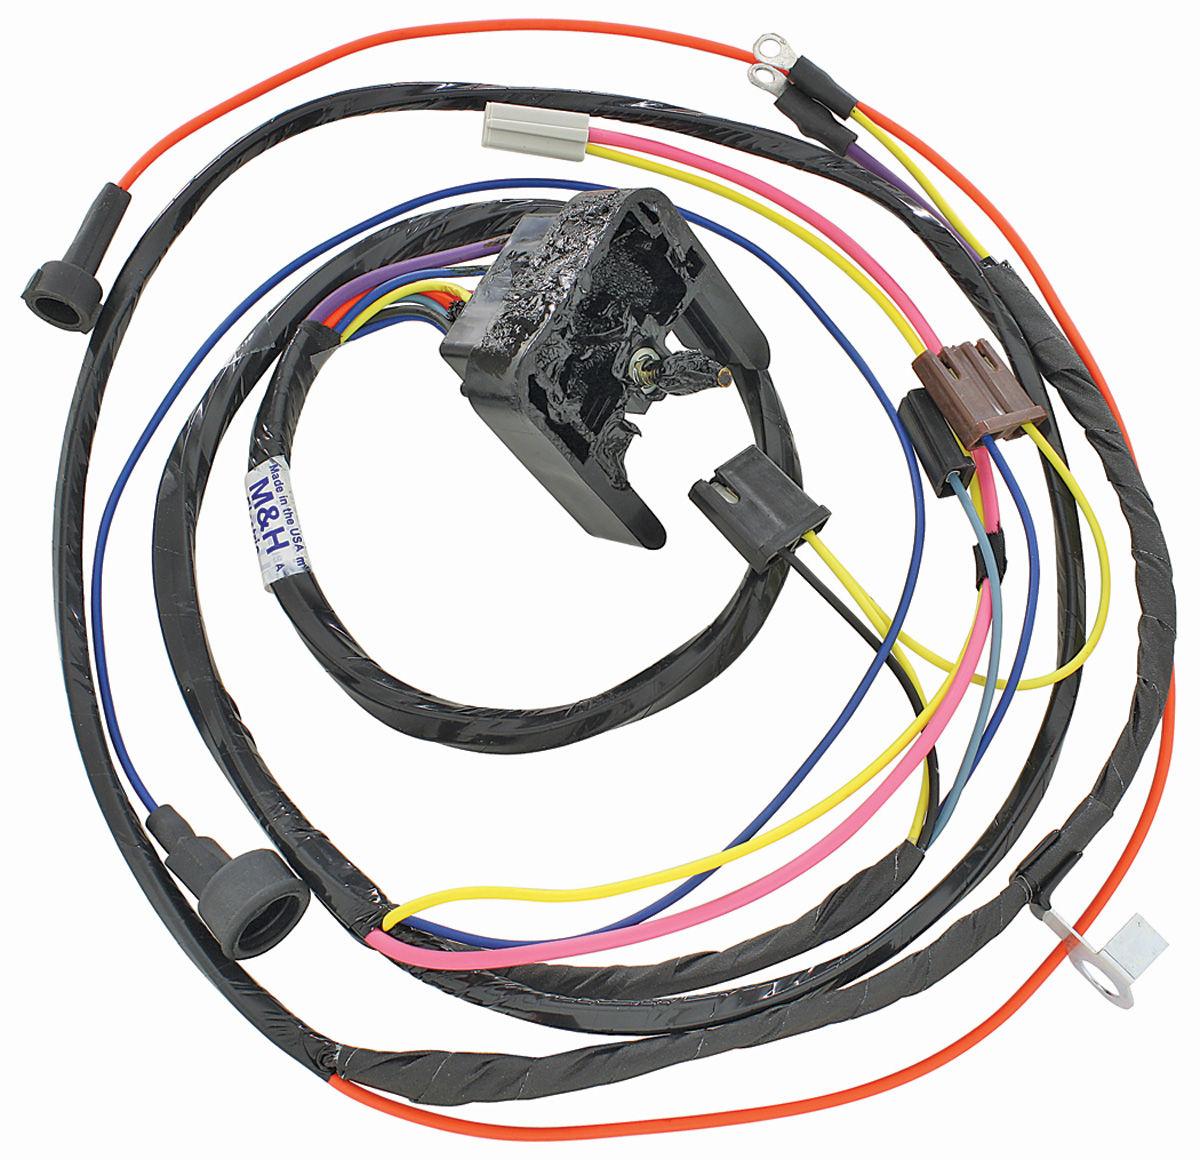 medium resolution of original 68 camaro wiring harness complete wiring diagram inside1968 camaro engine wiring diagram schematic 21